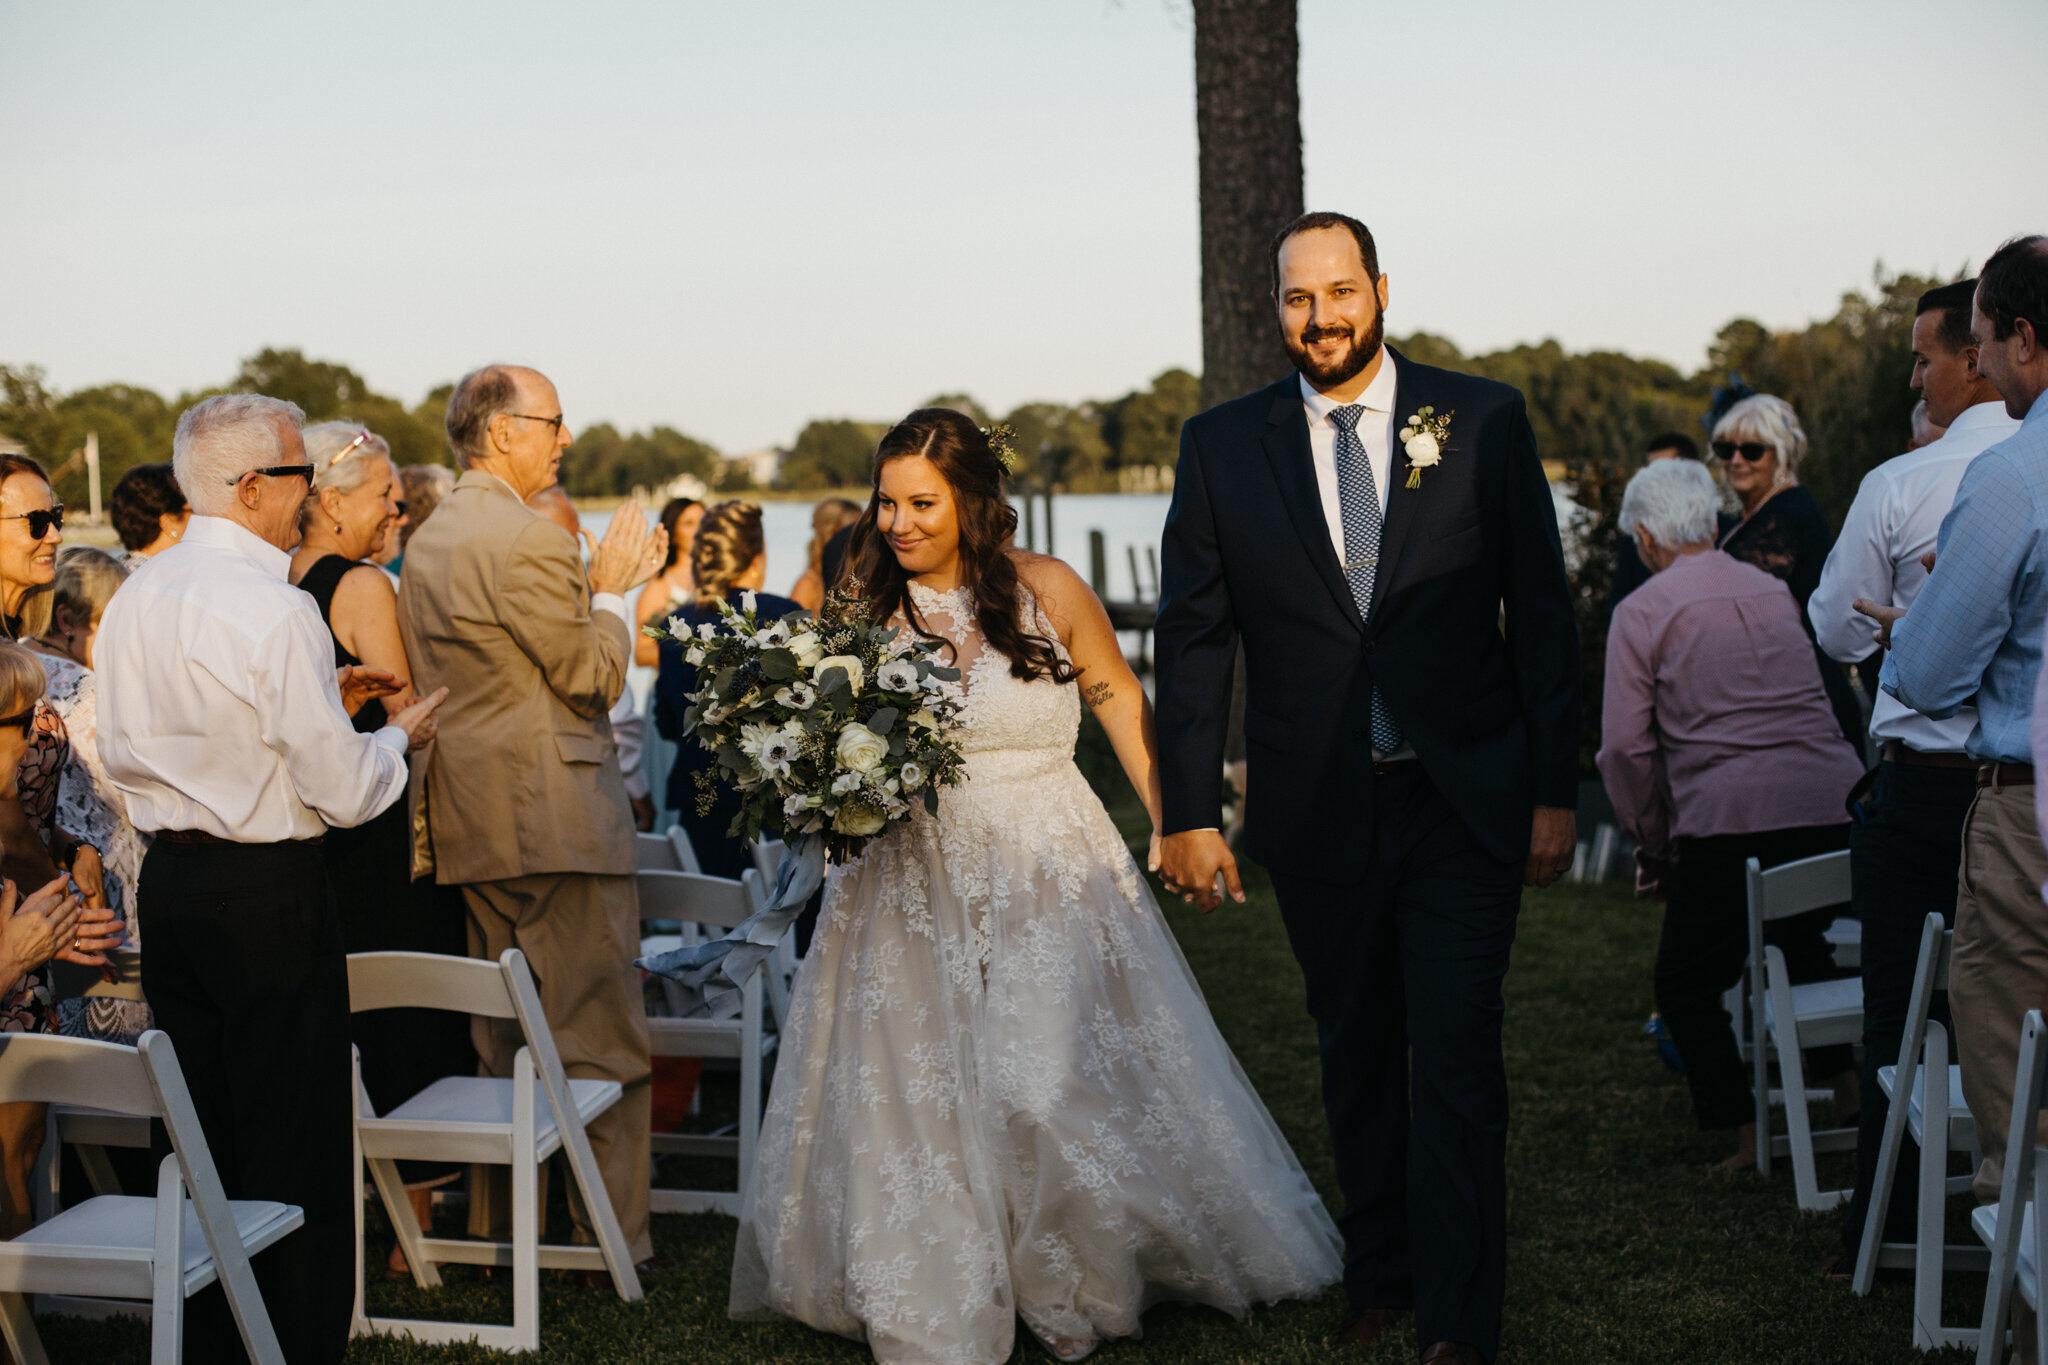 angela_jason_norfolk_wedding-109.jpg